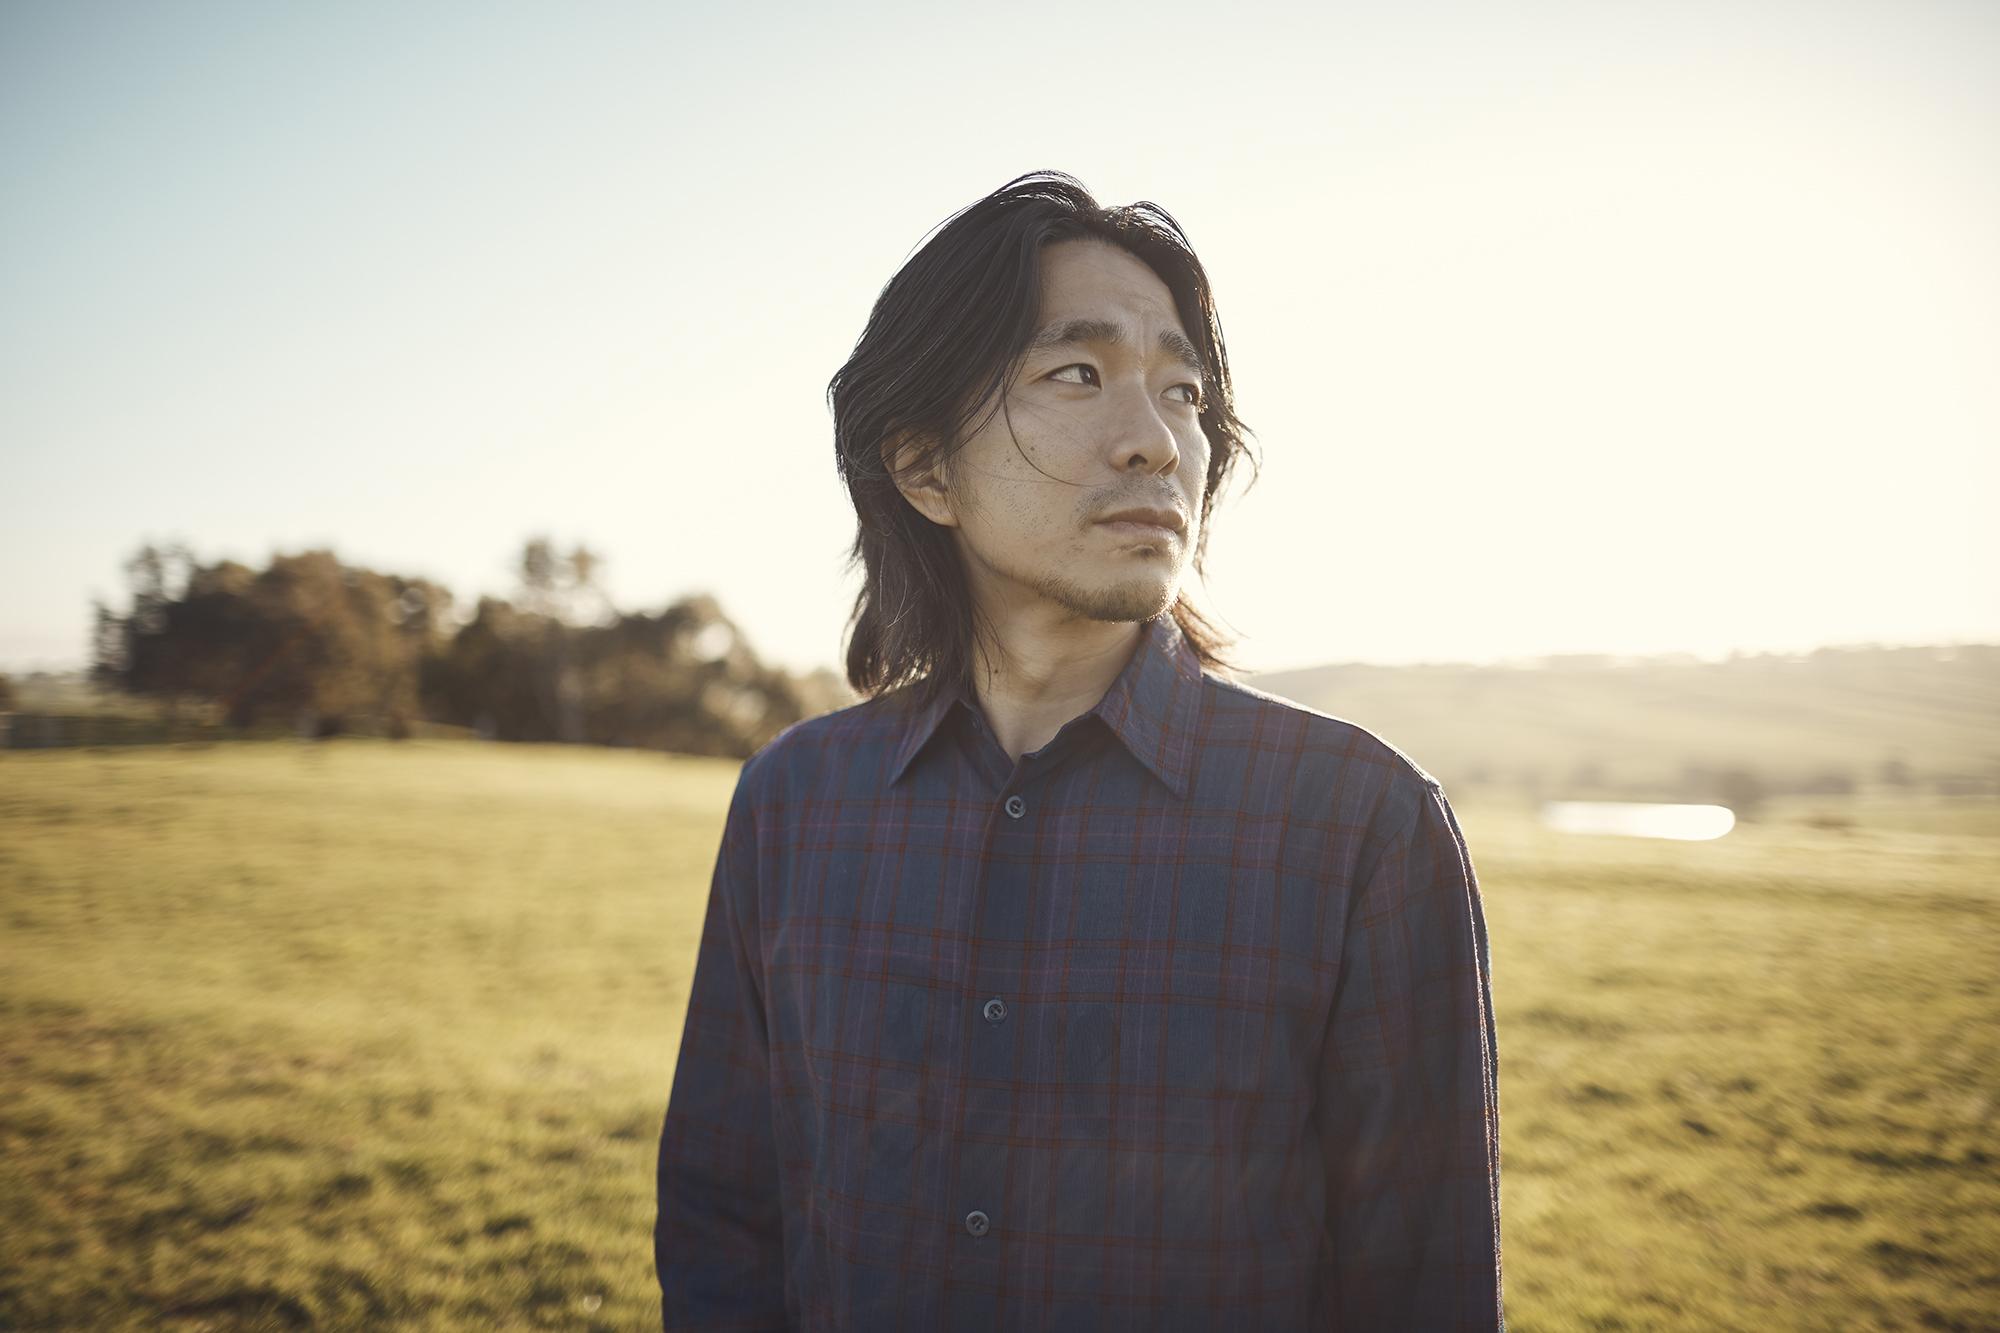 Hiromichi Ochiai of Facestasm